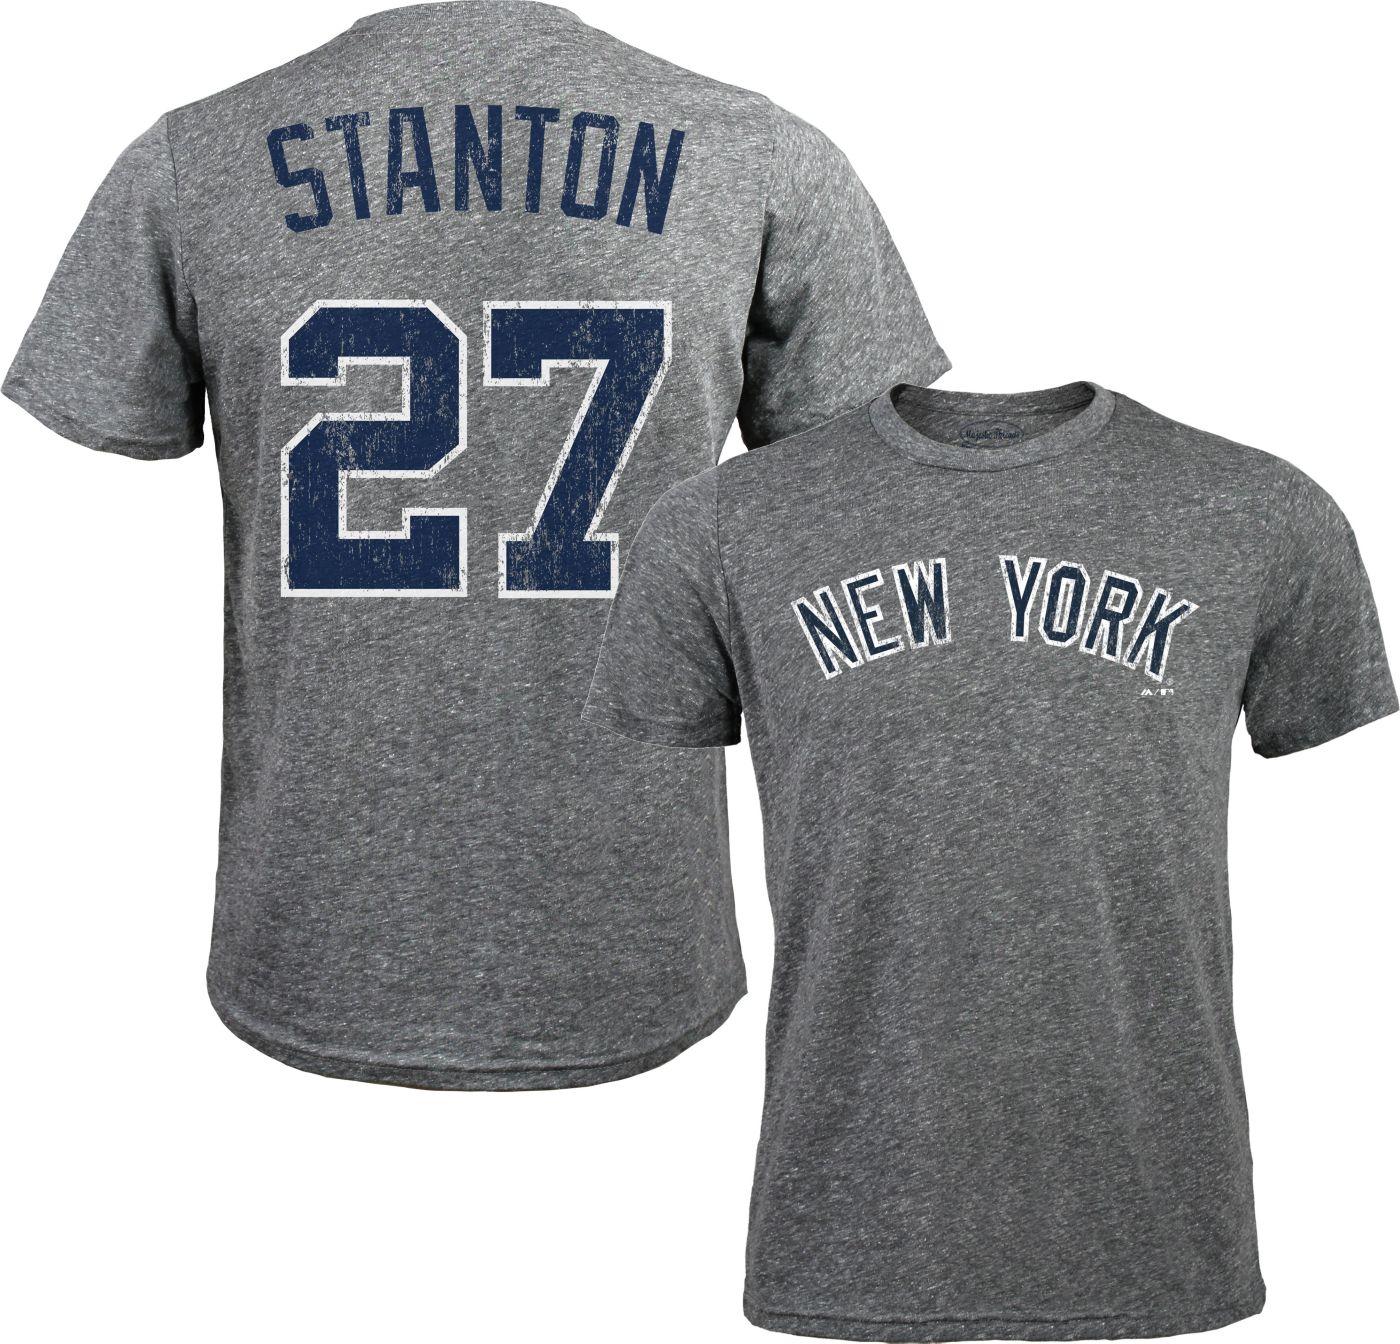 Majestic Threads Men's New York Yankees Giancarlo Stanton #27 Grey Tri-Blend T-Shirt